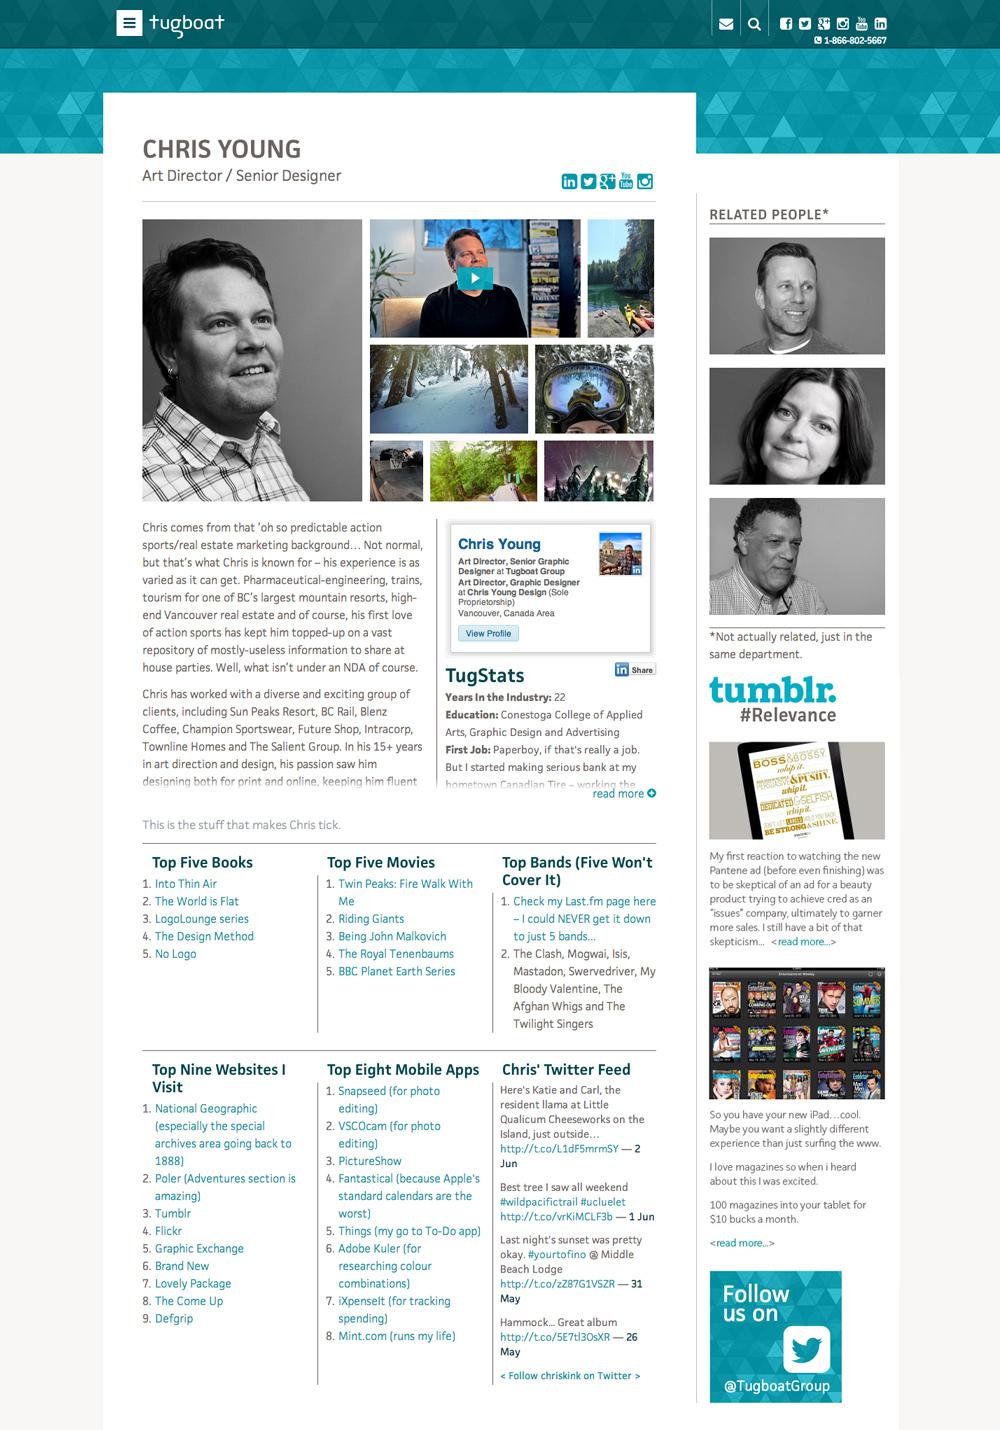 tugboat-website-08-crew-page-chris-hg